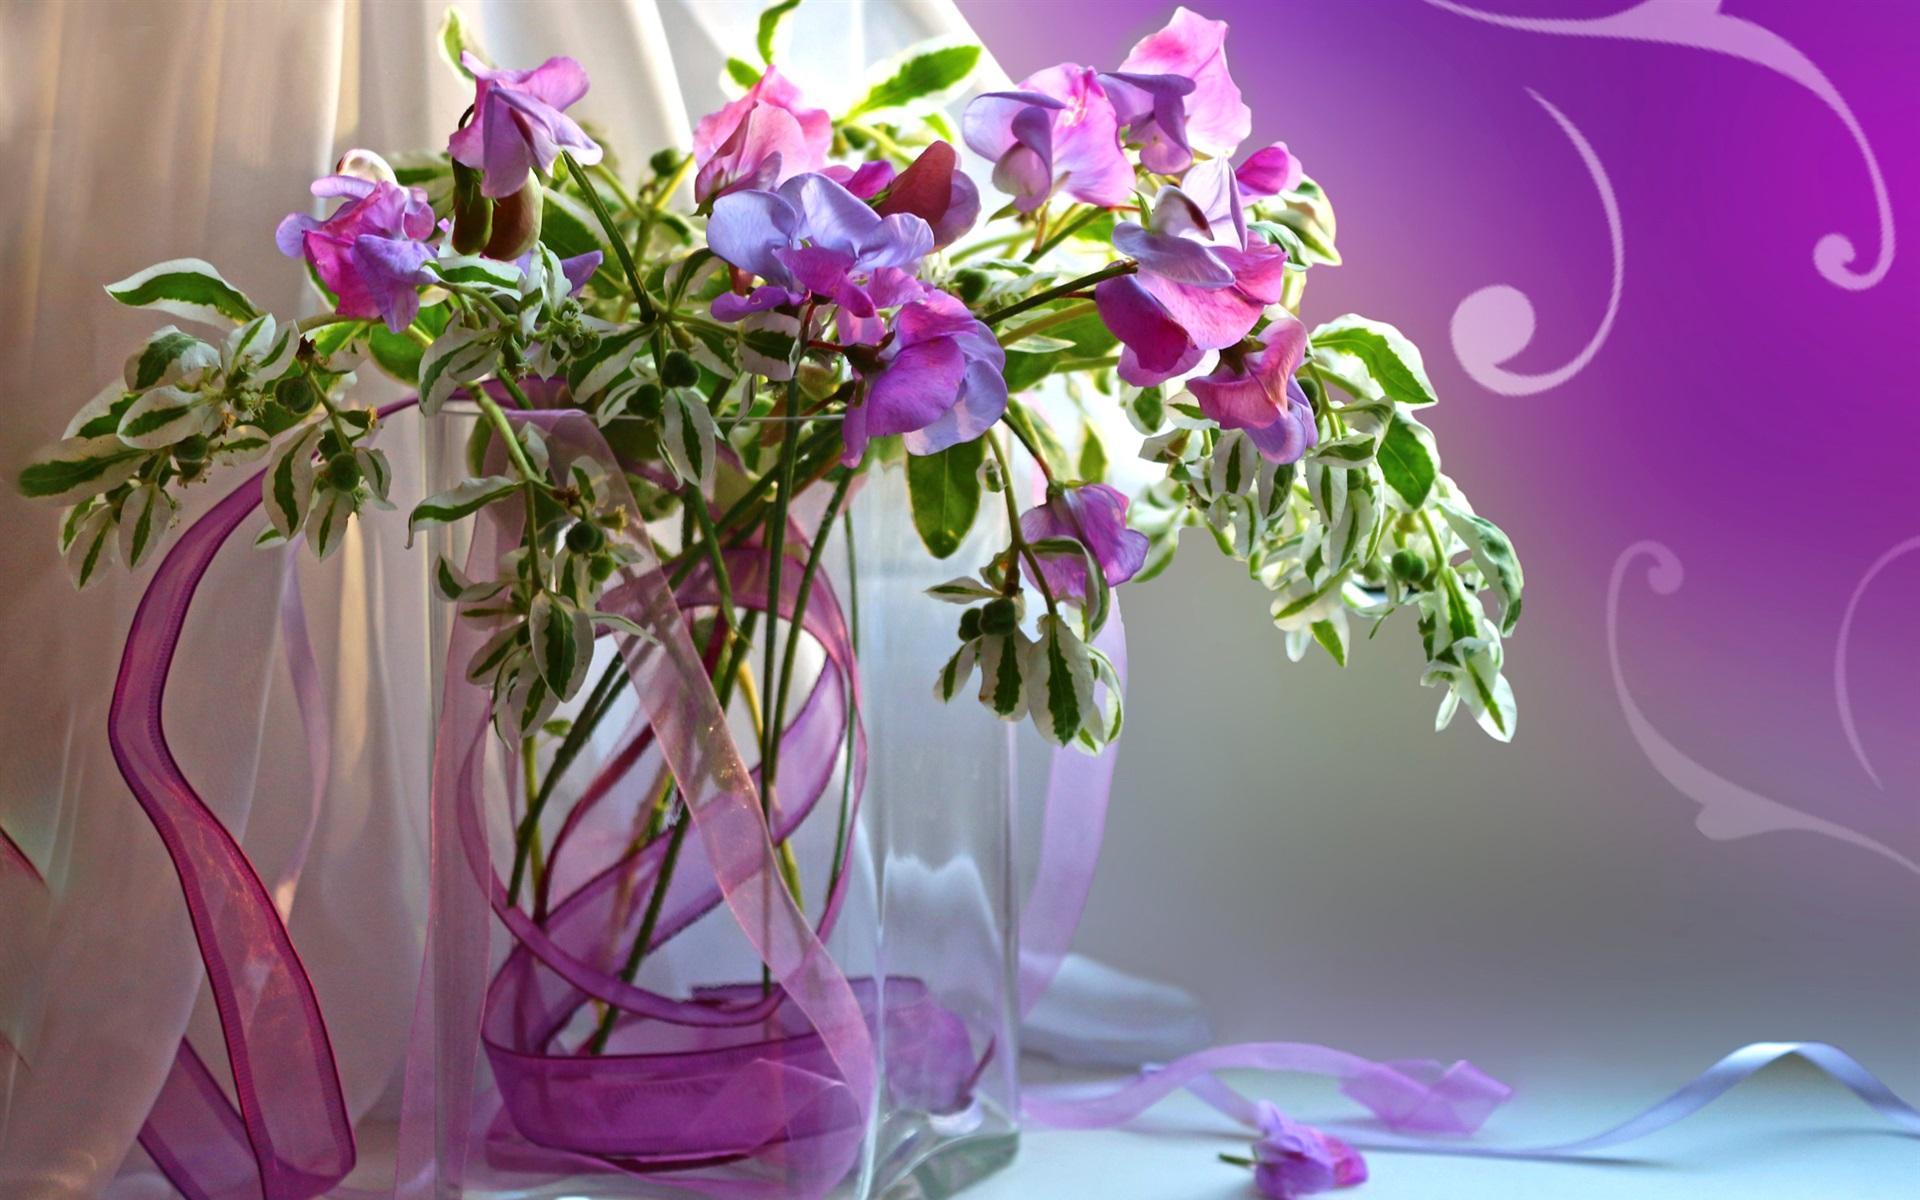 Wallpaper Still Life Vase Purple Flowers Petals 1920x1200 Hd